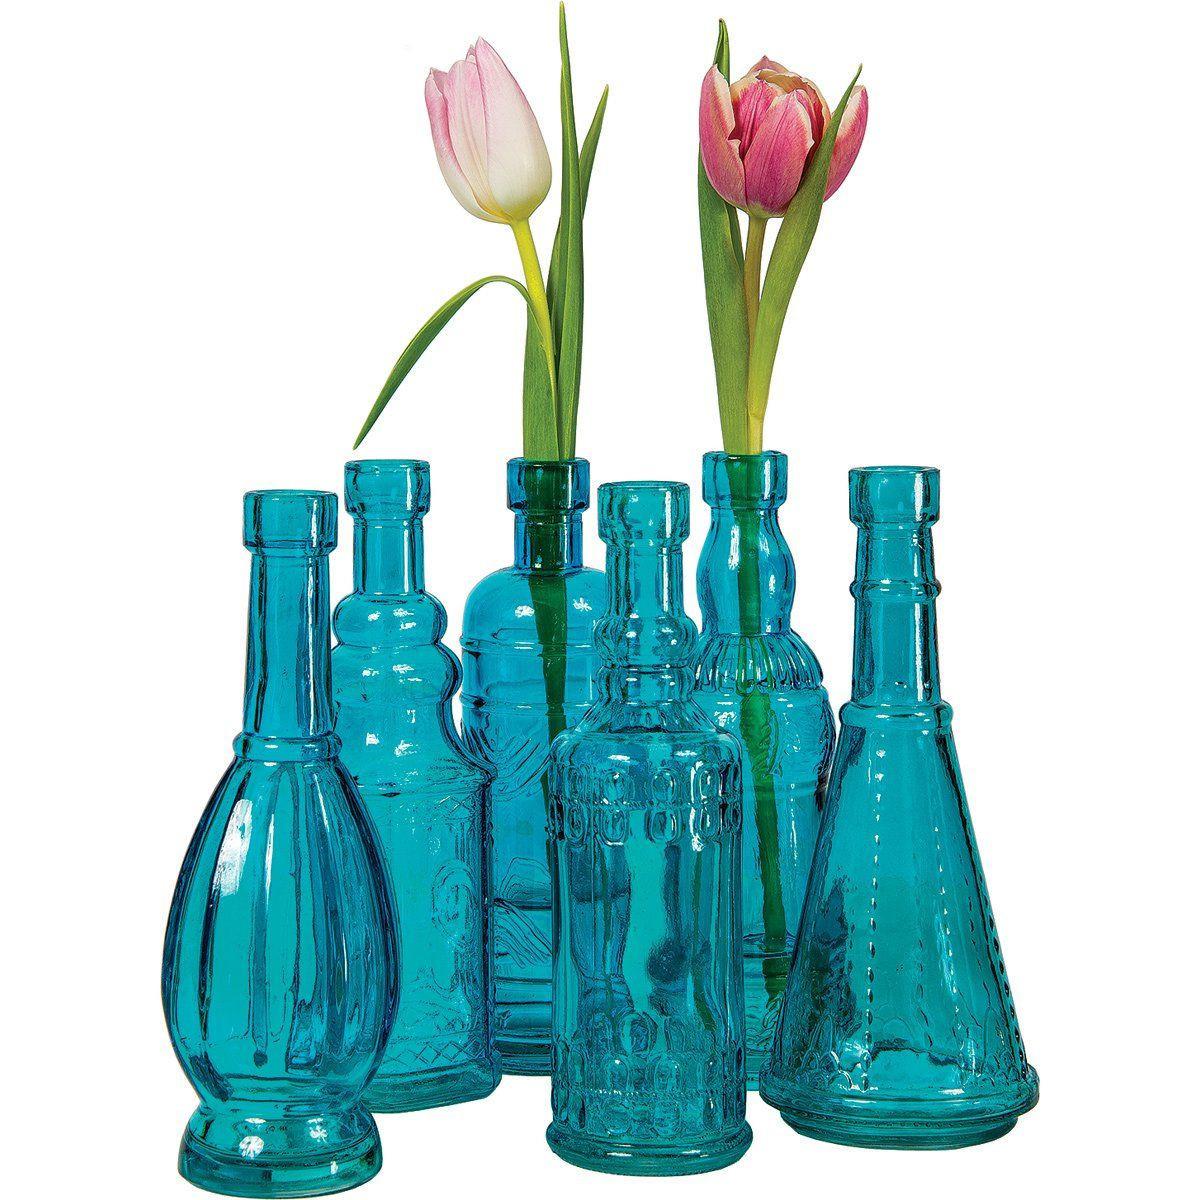 Small Vintage Vases Bulk Of Small Crystal Vase Photograph Luna Bazaar Small Vintage Glass Bottle Throughout Small Crystal Vase Photograph Luna Bazaar Small Vintage Glass Bottle Set 7 Inch Turquoise Blue Of